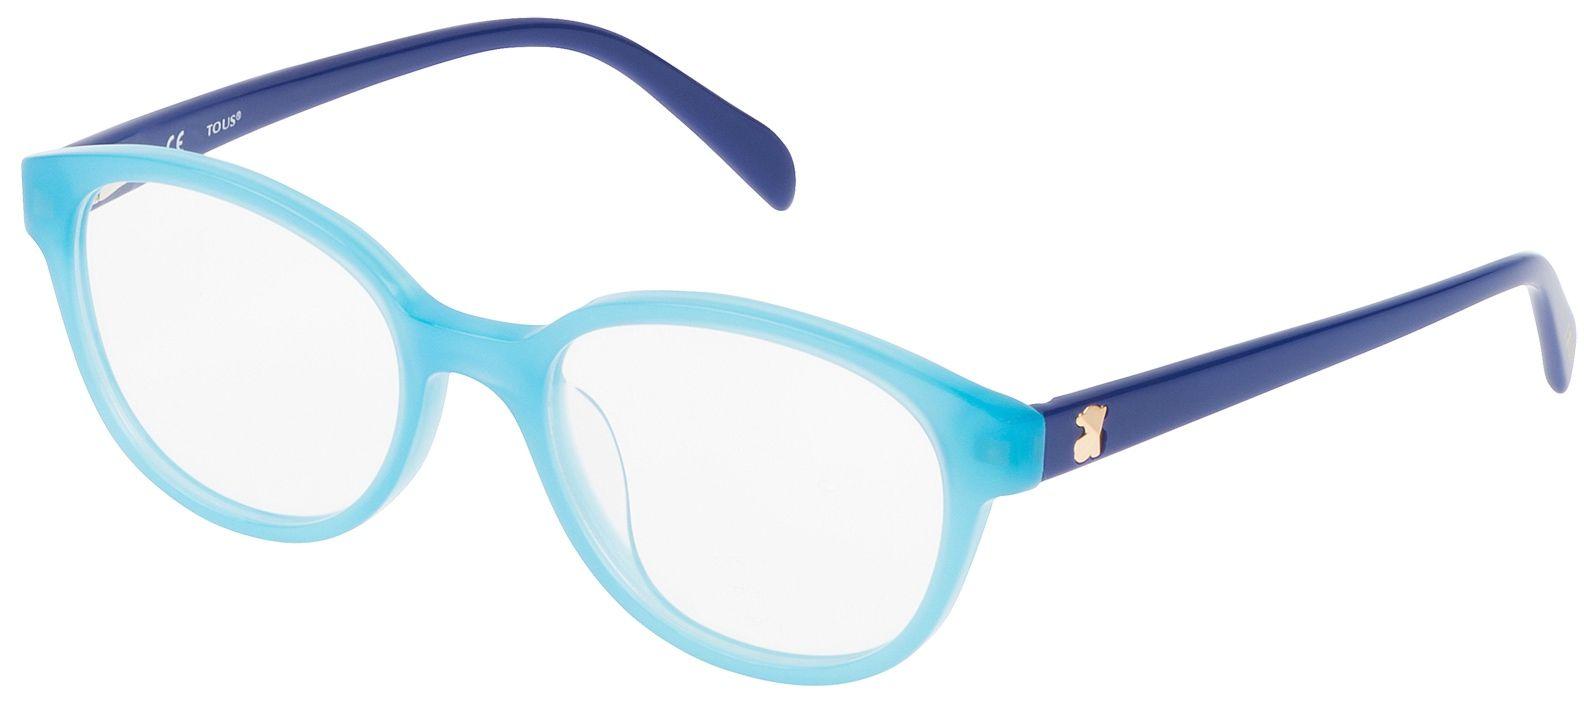 c690c007a4 TOUS VTO 524 #Tous #Gafas #GafasGraduadas #GafasDeVista #Mujer #EyeLenses  #EyeGlasses #Eyewear #Woman